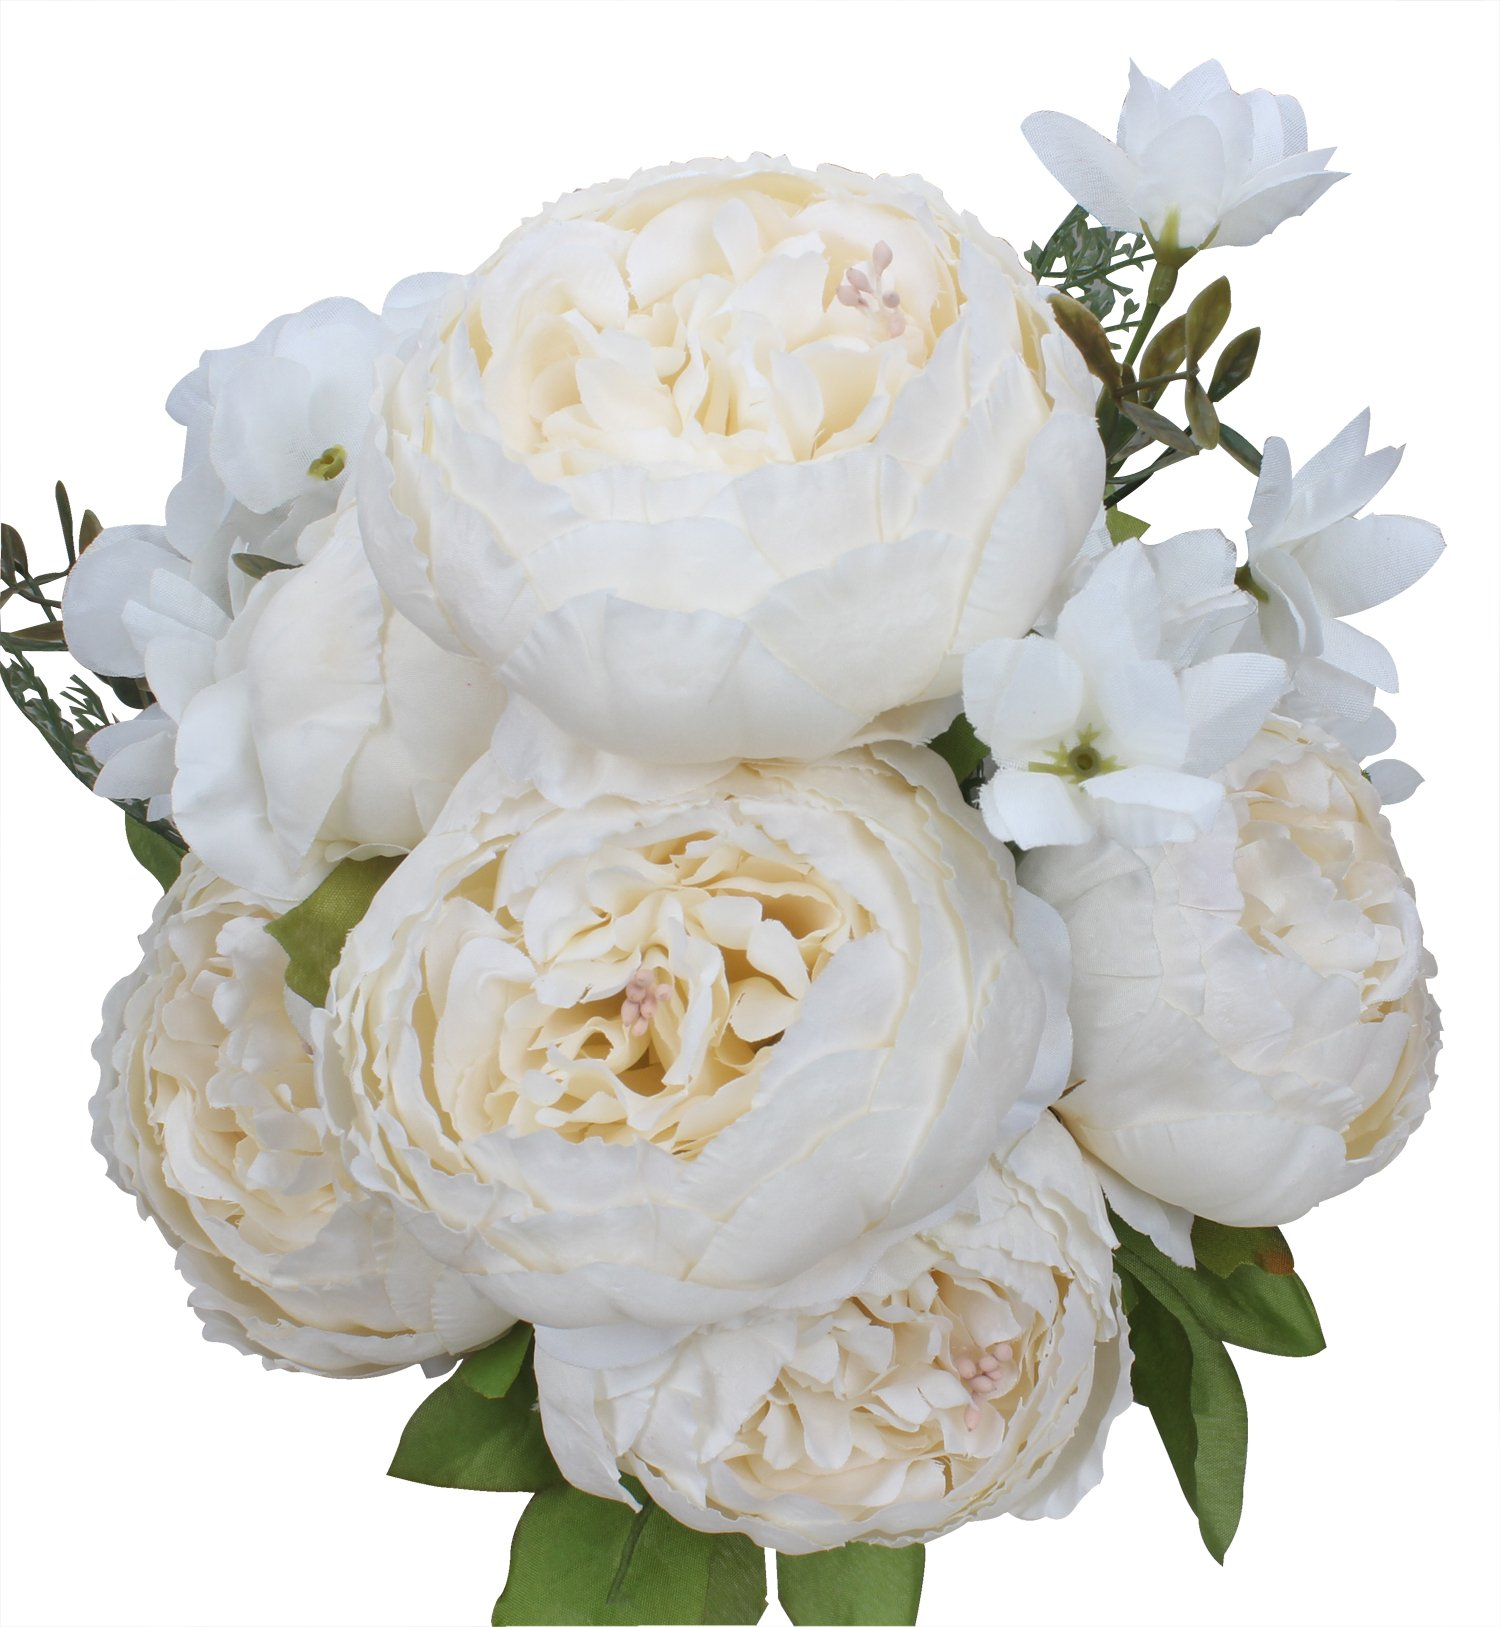 silk flower arrangements duovlo artificial peony silk flowers fake flowers vintage wedding home decoration,pack of 1 (spring milk white)